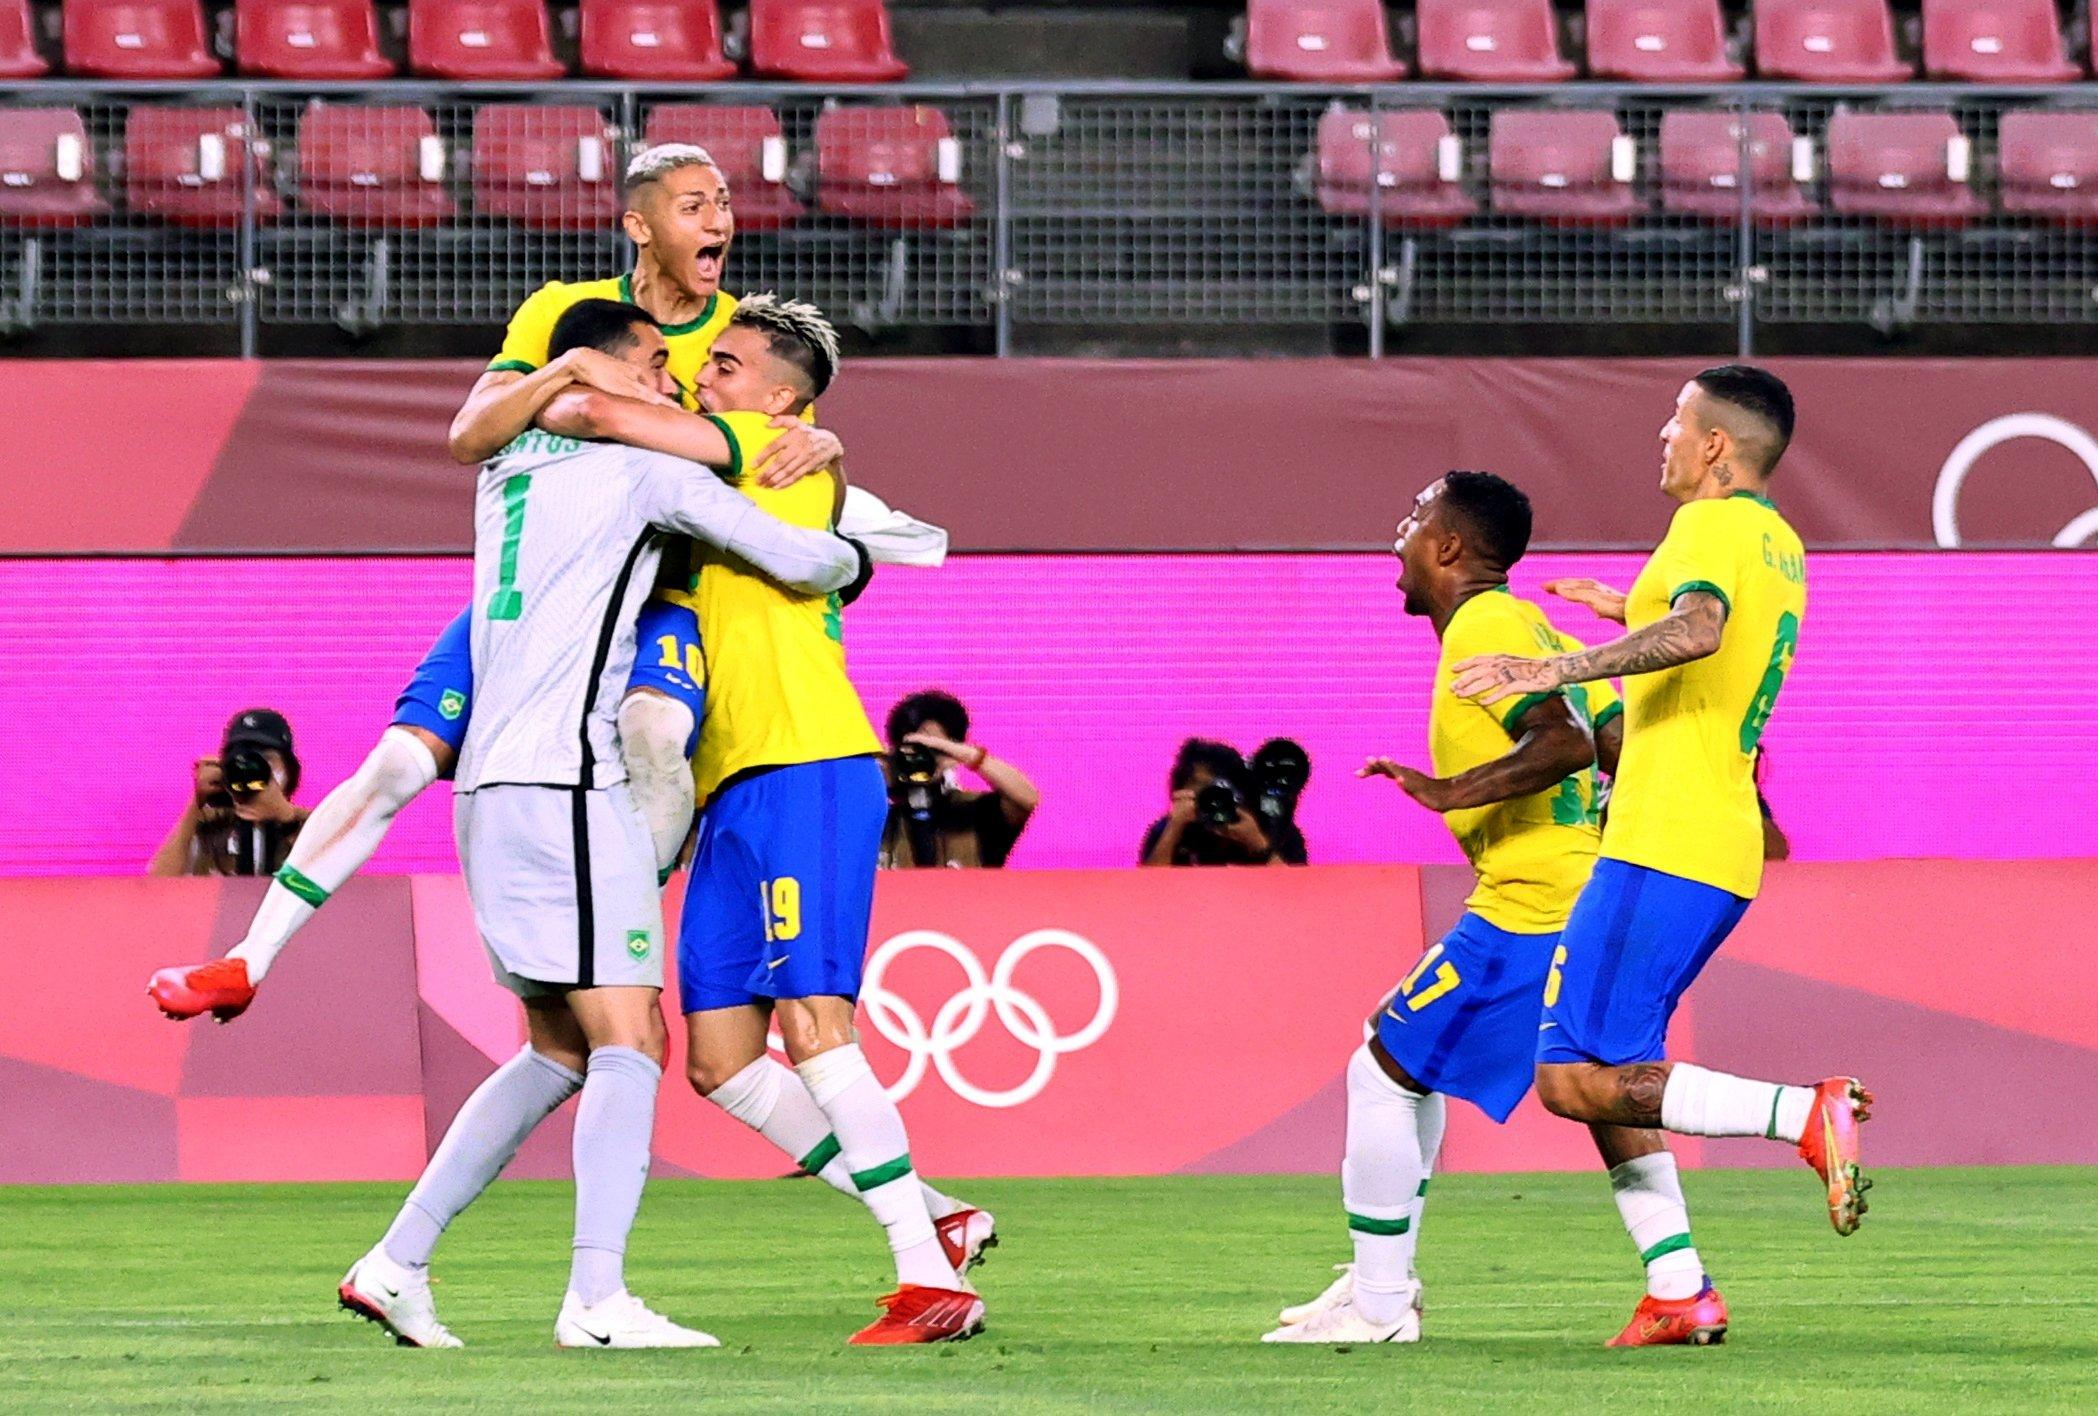 Brazilian playerscelebrate winning the penalty shootout against Mexico in the Tokyo 2020 Olympics men's semifinal,Ibaraki Kashima Stadium, Ibaraki, Japan, Aug. 3, 2021. (Reuters Photo)